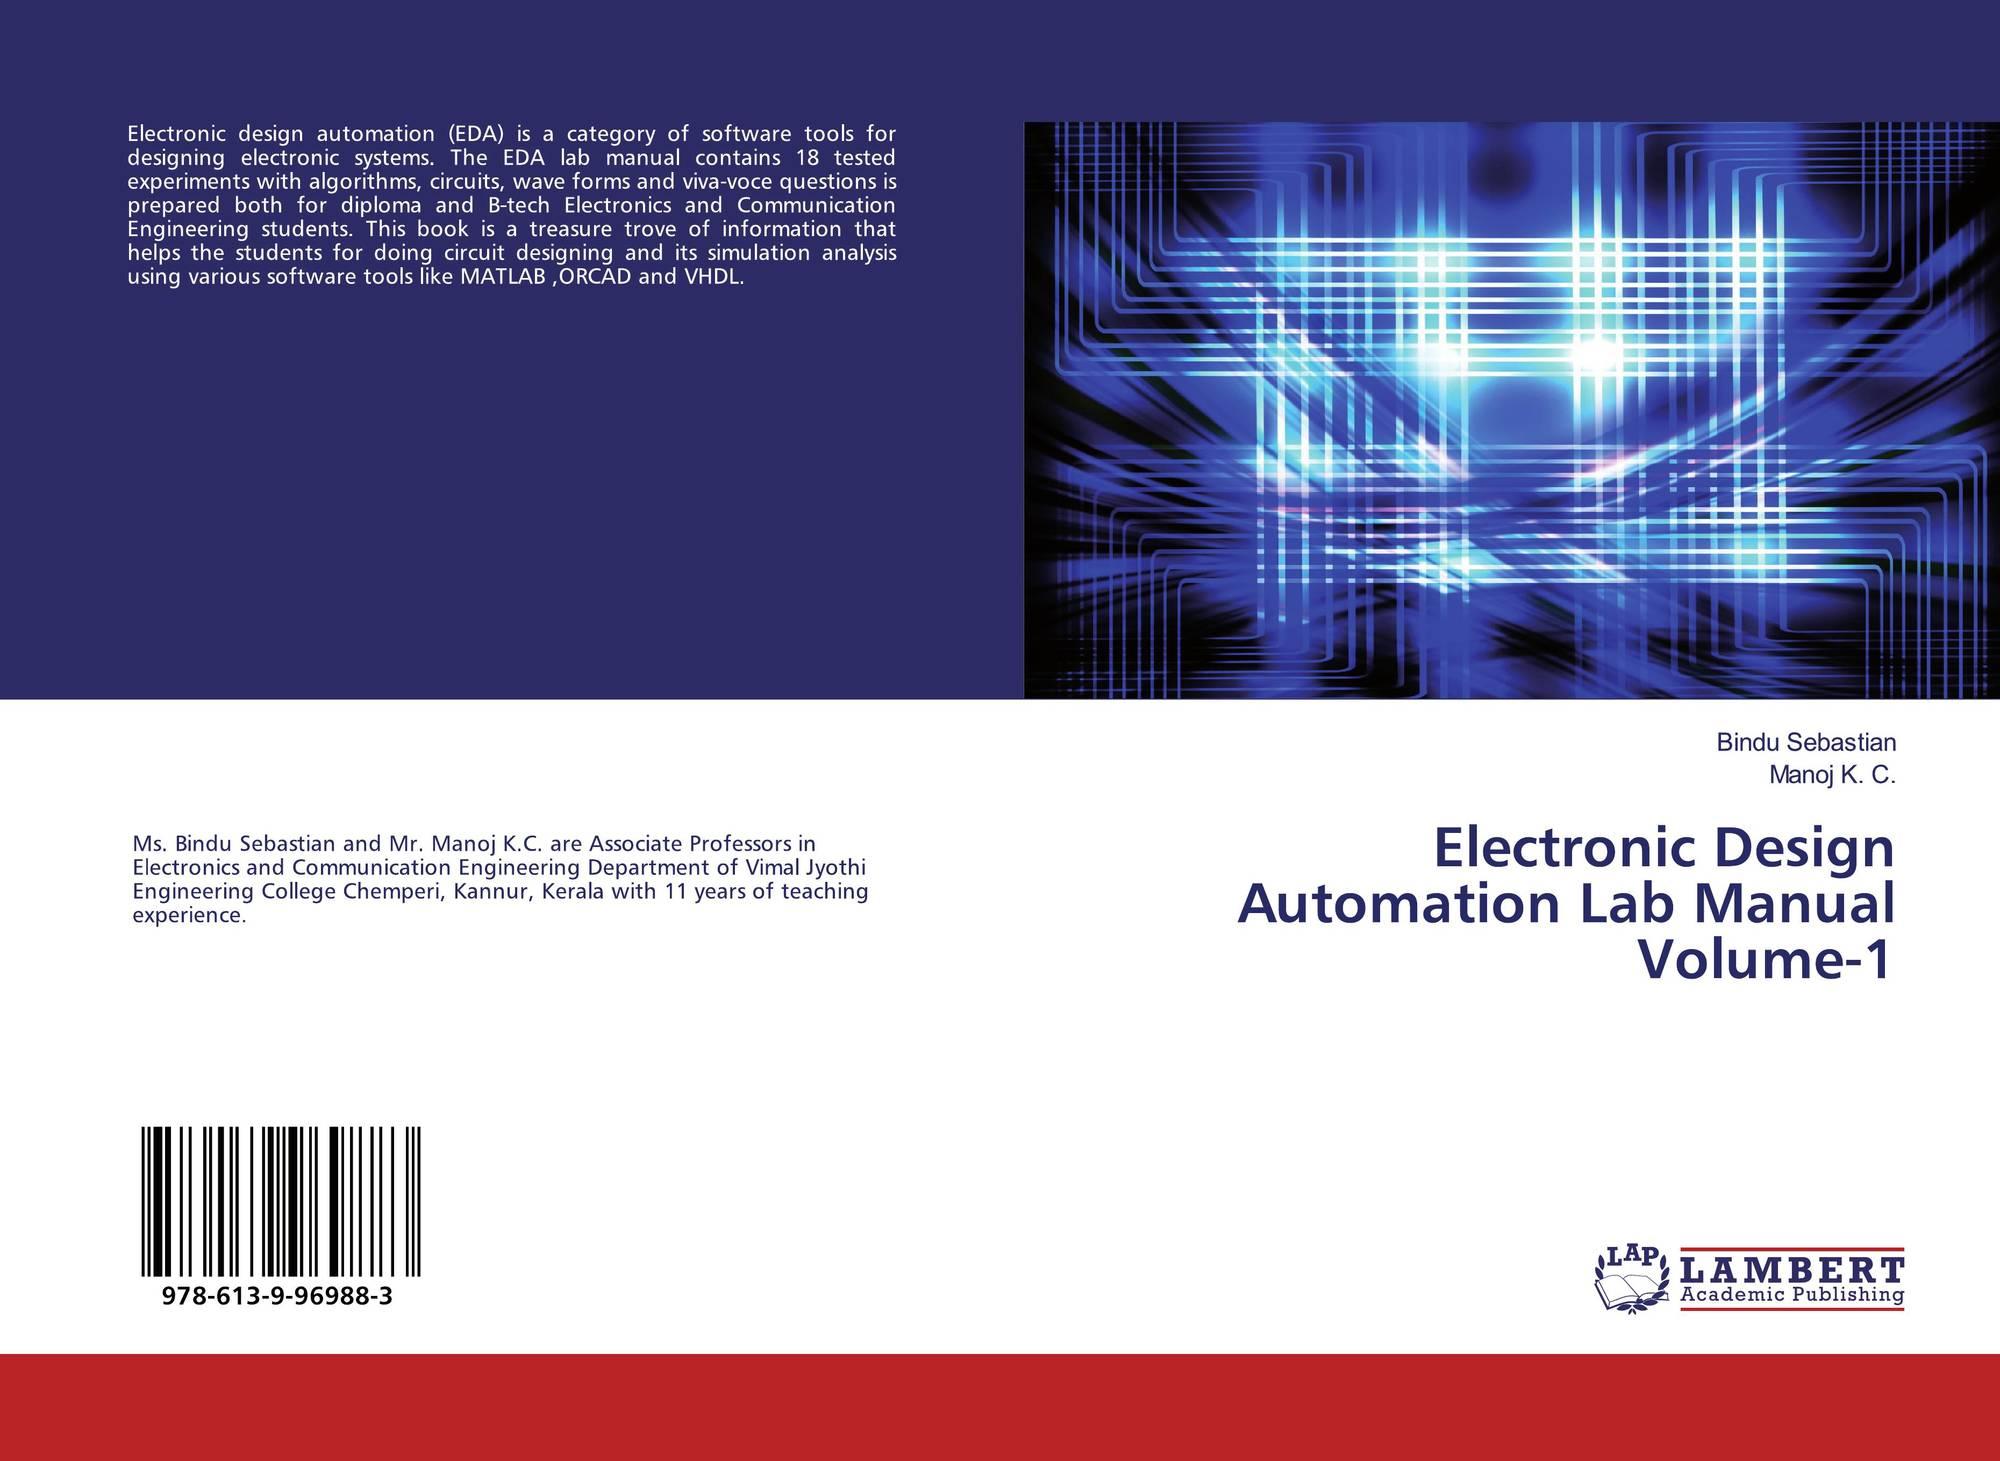 electronic design automation lab manual volume 1, 978 613 9 96988 3electronic design automation lab manual volume 1